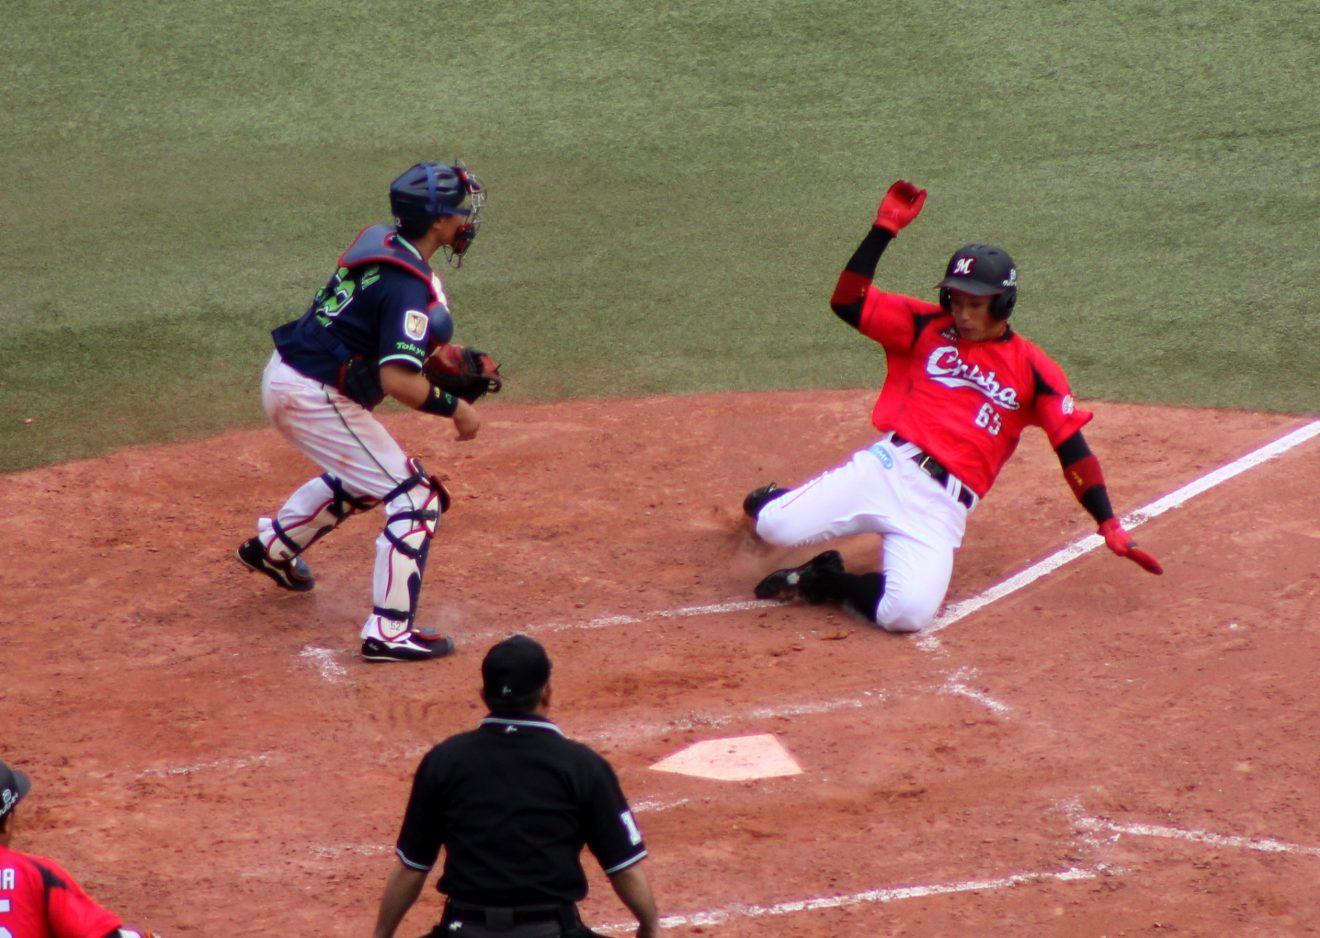 Chiba Marines vs. Tokyo Swallows